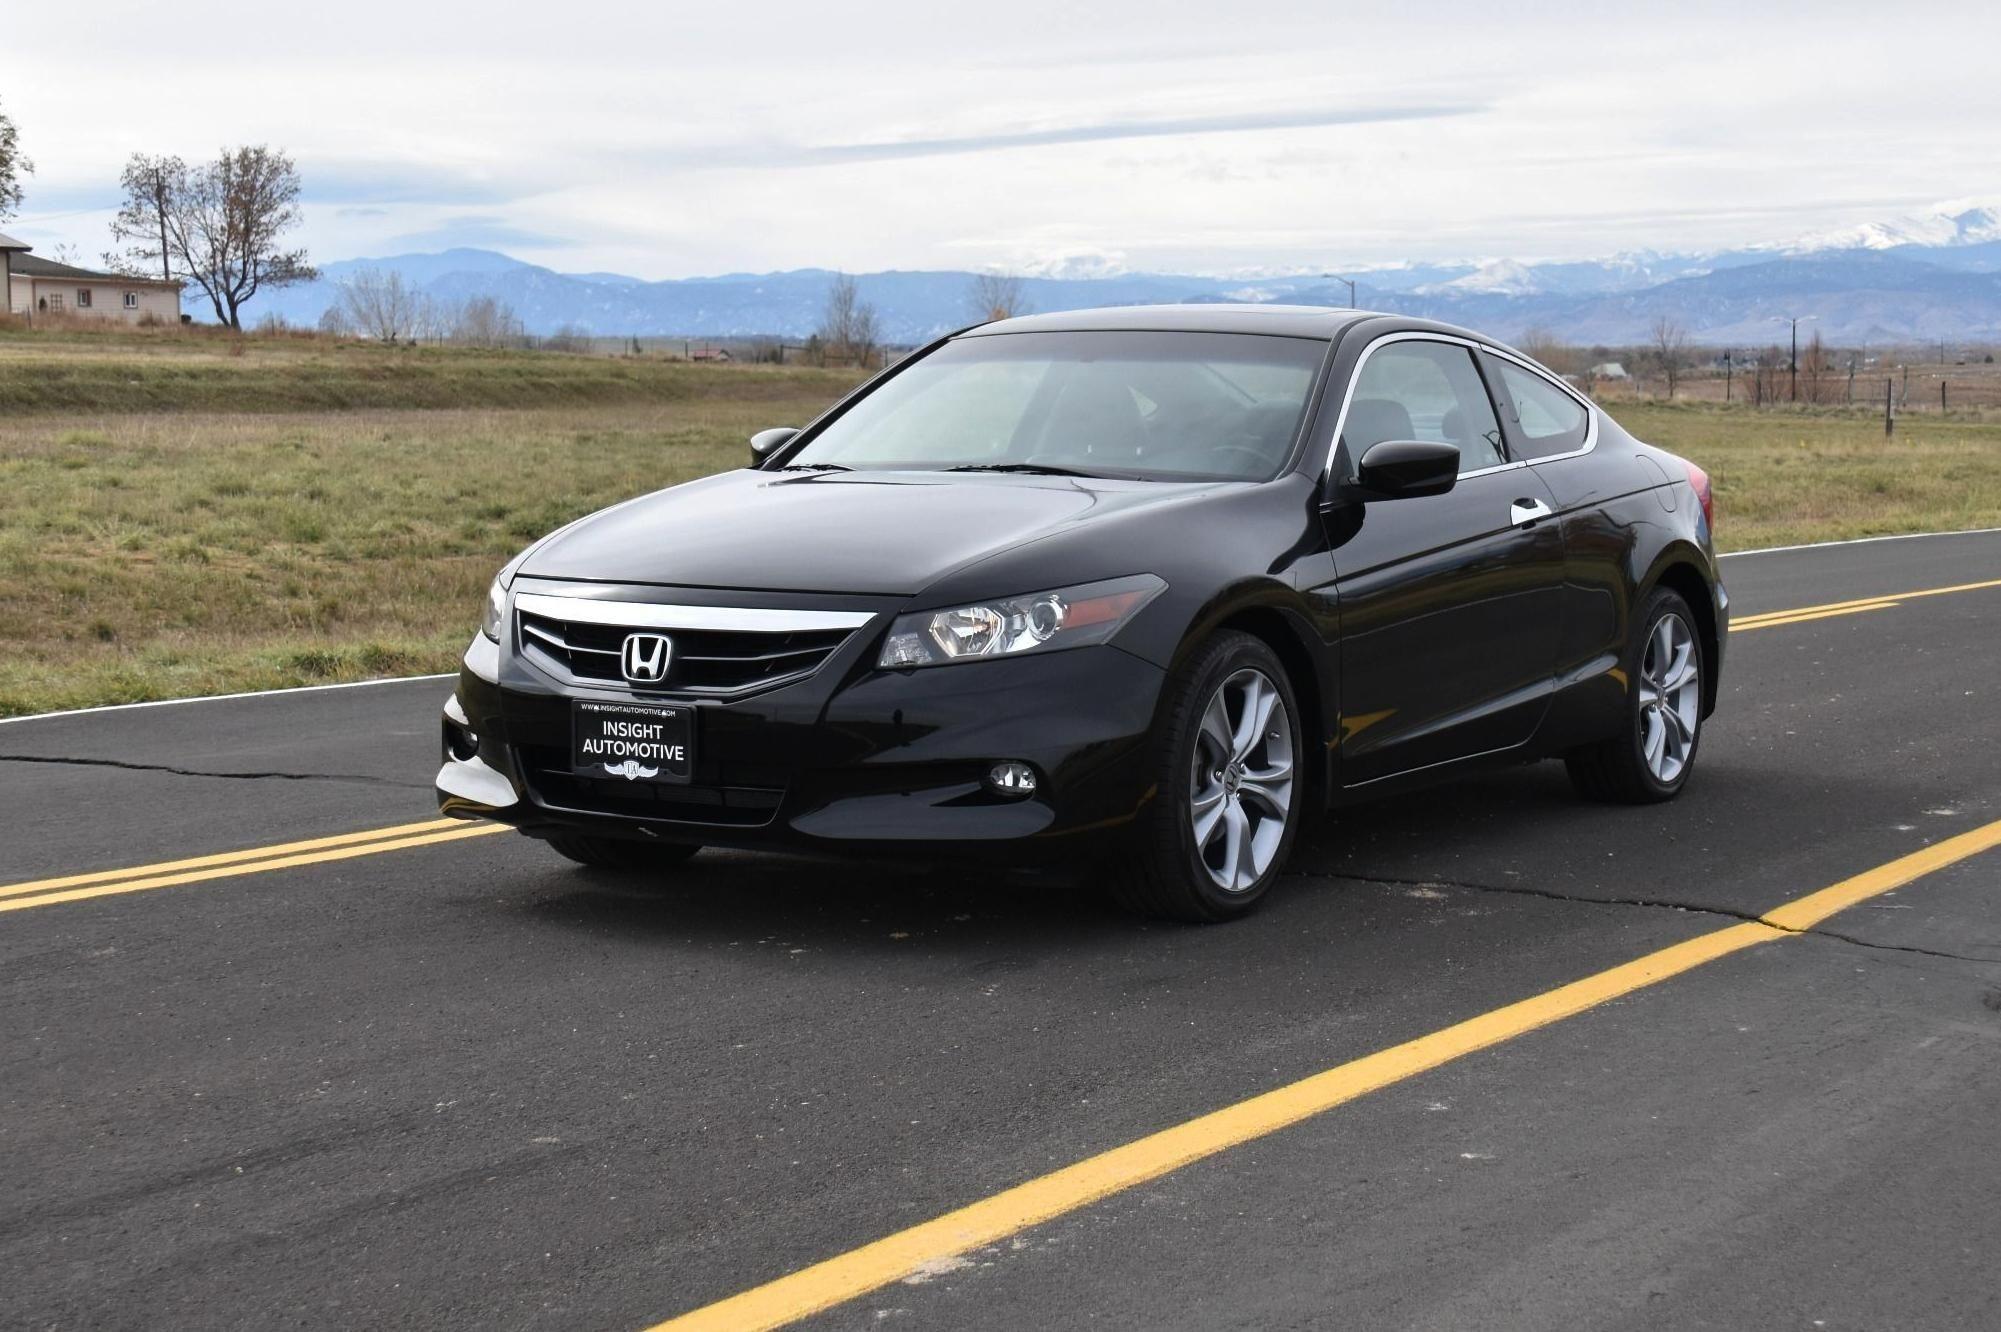 Car Inspection Diagram Sedan Both Sides 2012 Honda Accord Ex L V6 Of Car Inspection Diagram Sedan Both Sides